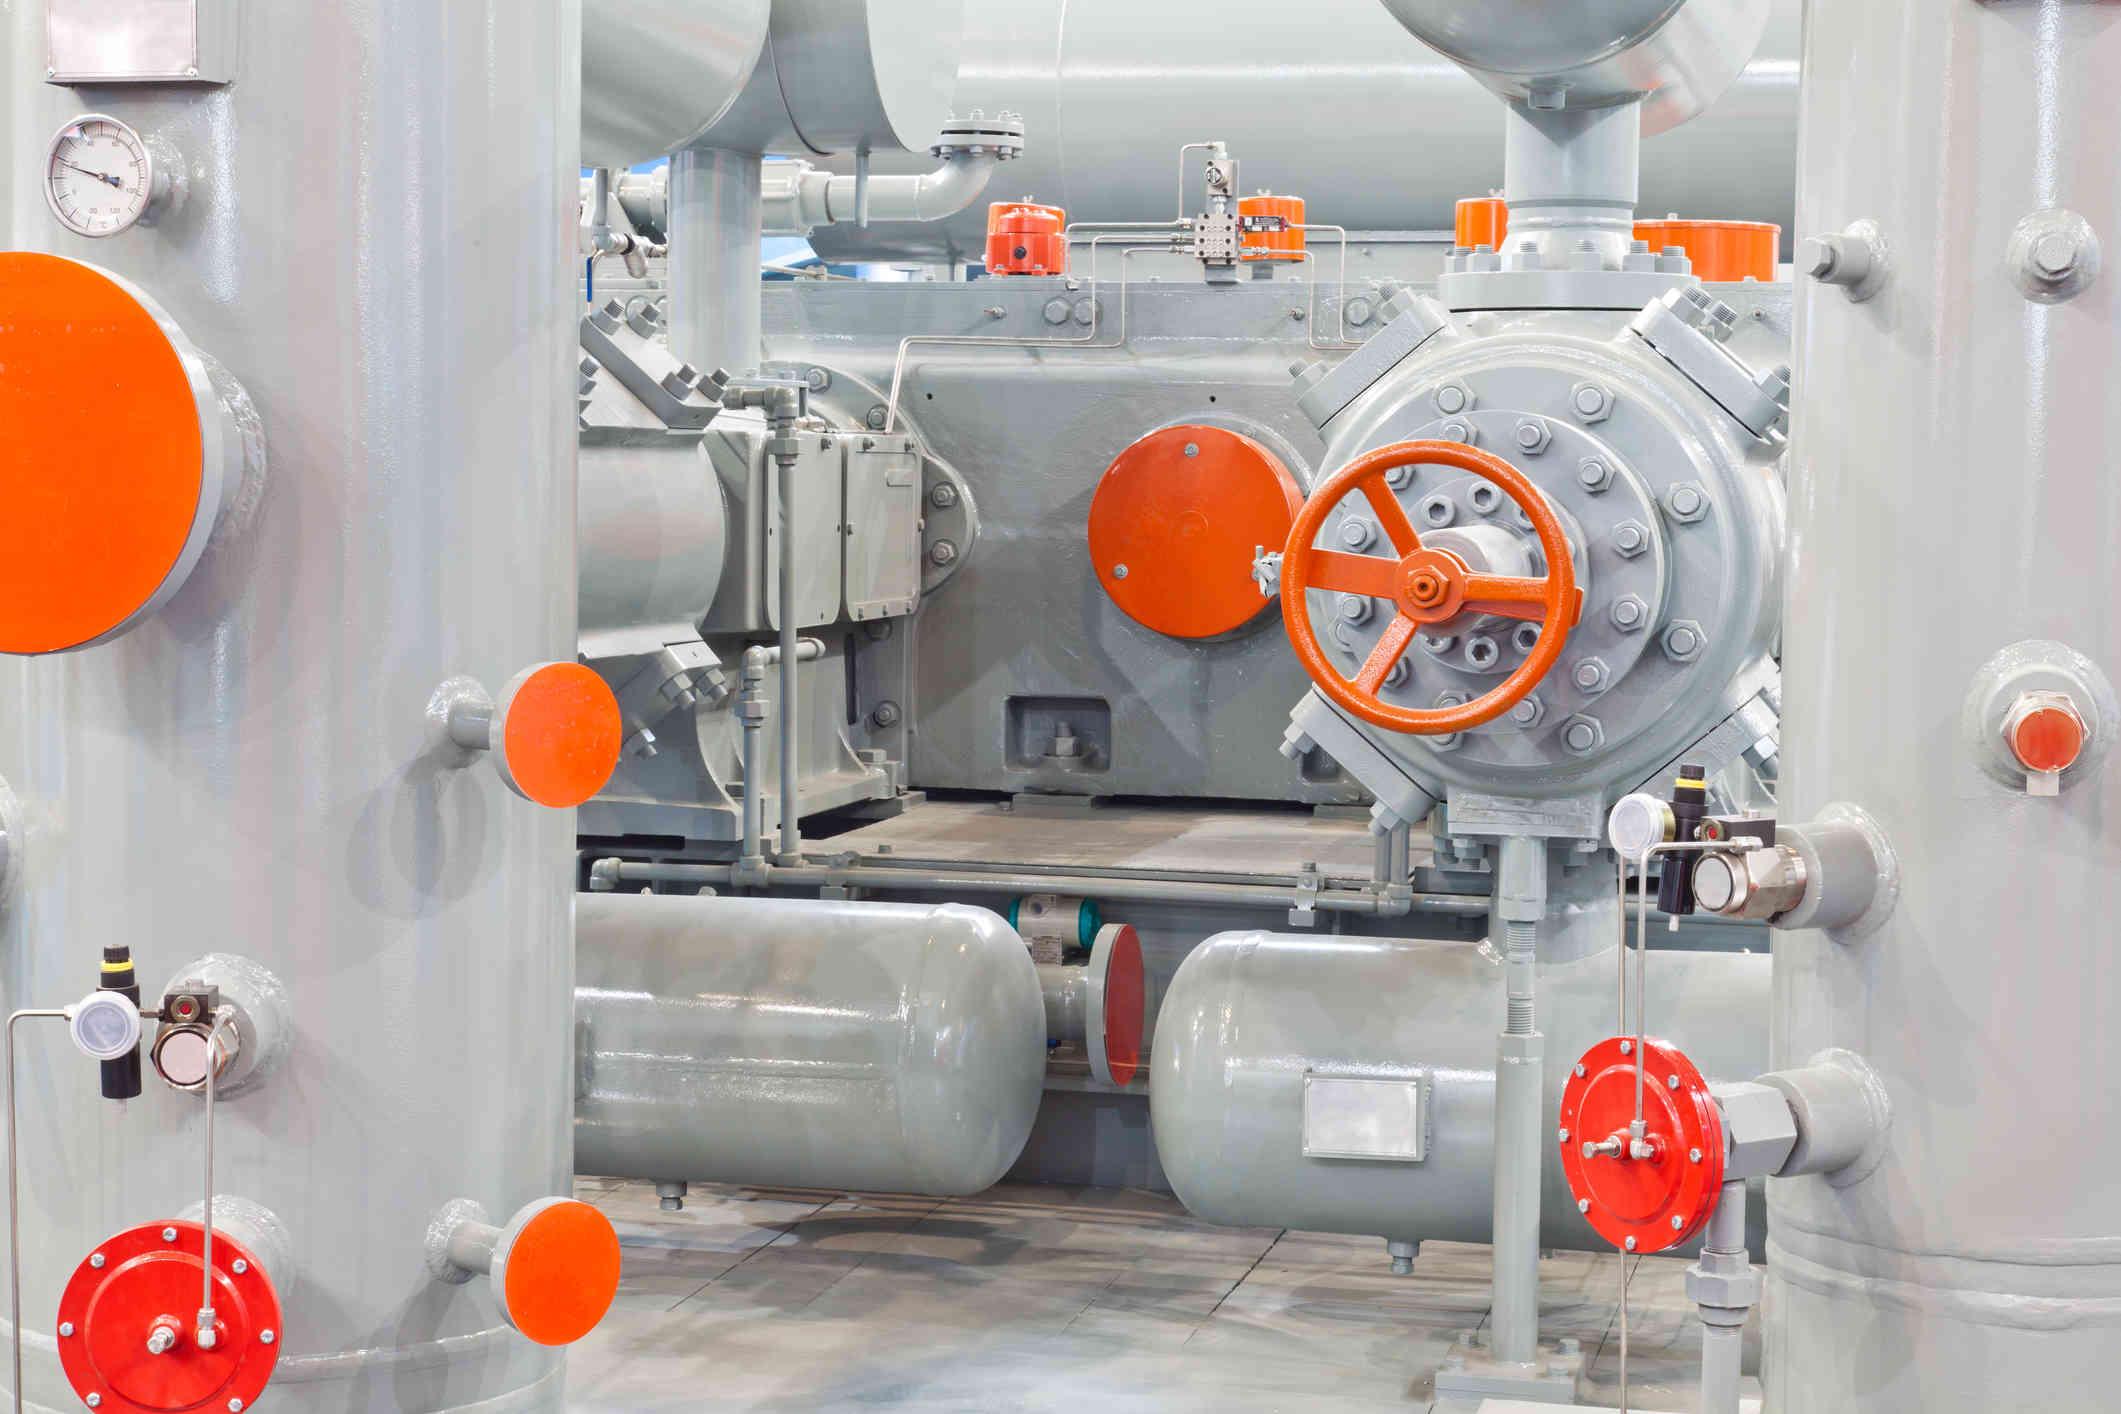 Top 5 Global CNG Compressor Manufacturers, Helping Shrink the Global Carbon Footprint